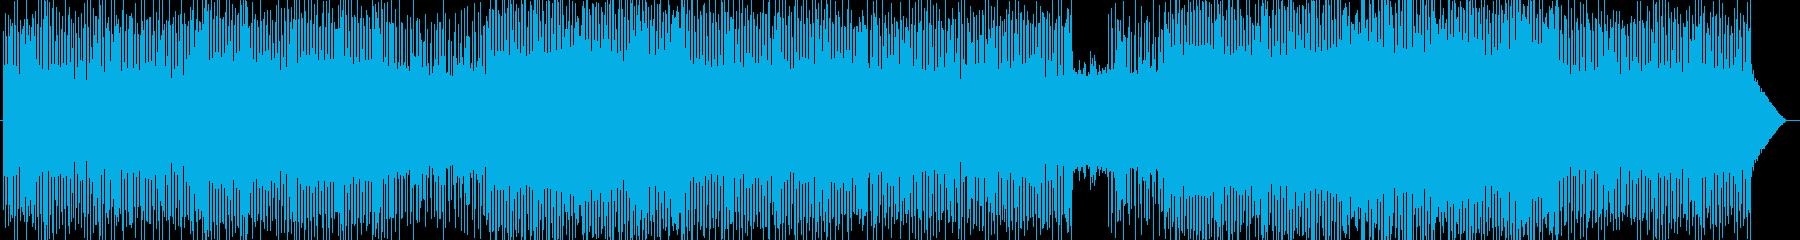 「HR/HM」「PUNK」BGM146の再生済みの波形